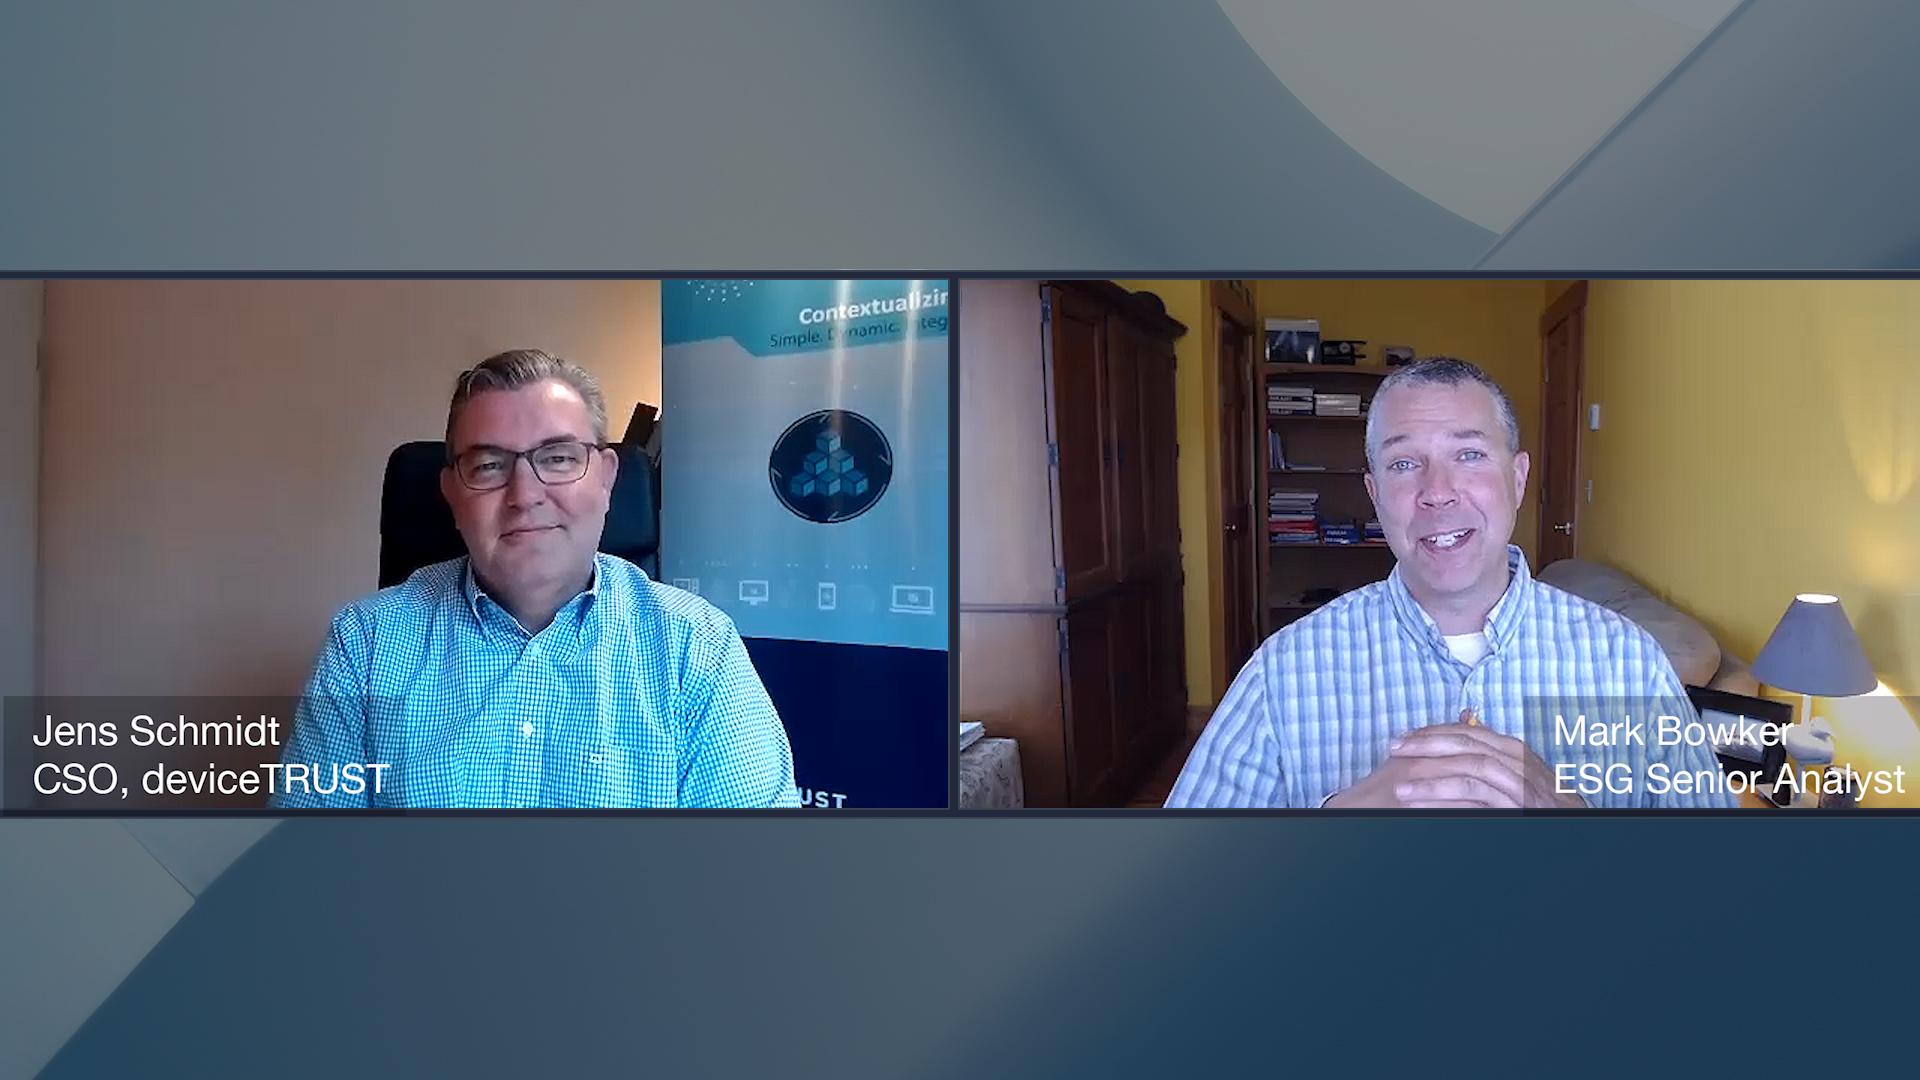 ESG360 Video: Digital Workspace Ecosystem Conversation with Jens Schmidt of deviceTRUST